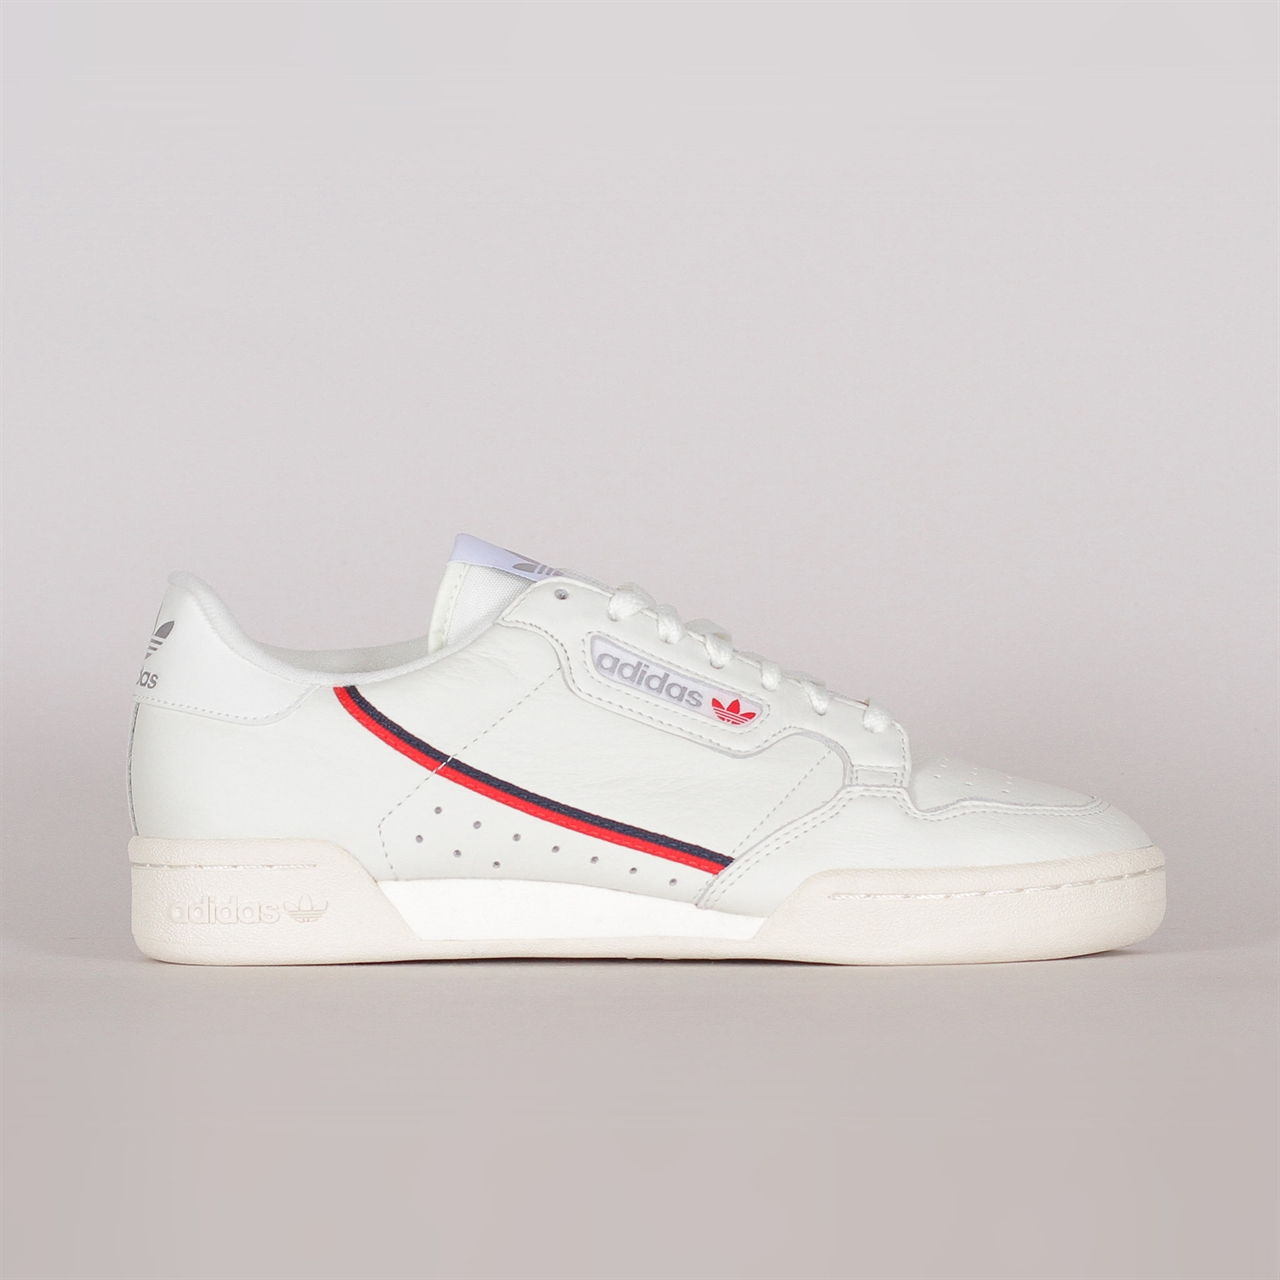 4162fc642470 Shelta - Adidas Originals Continental 80 Rascal (B41680)